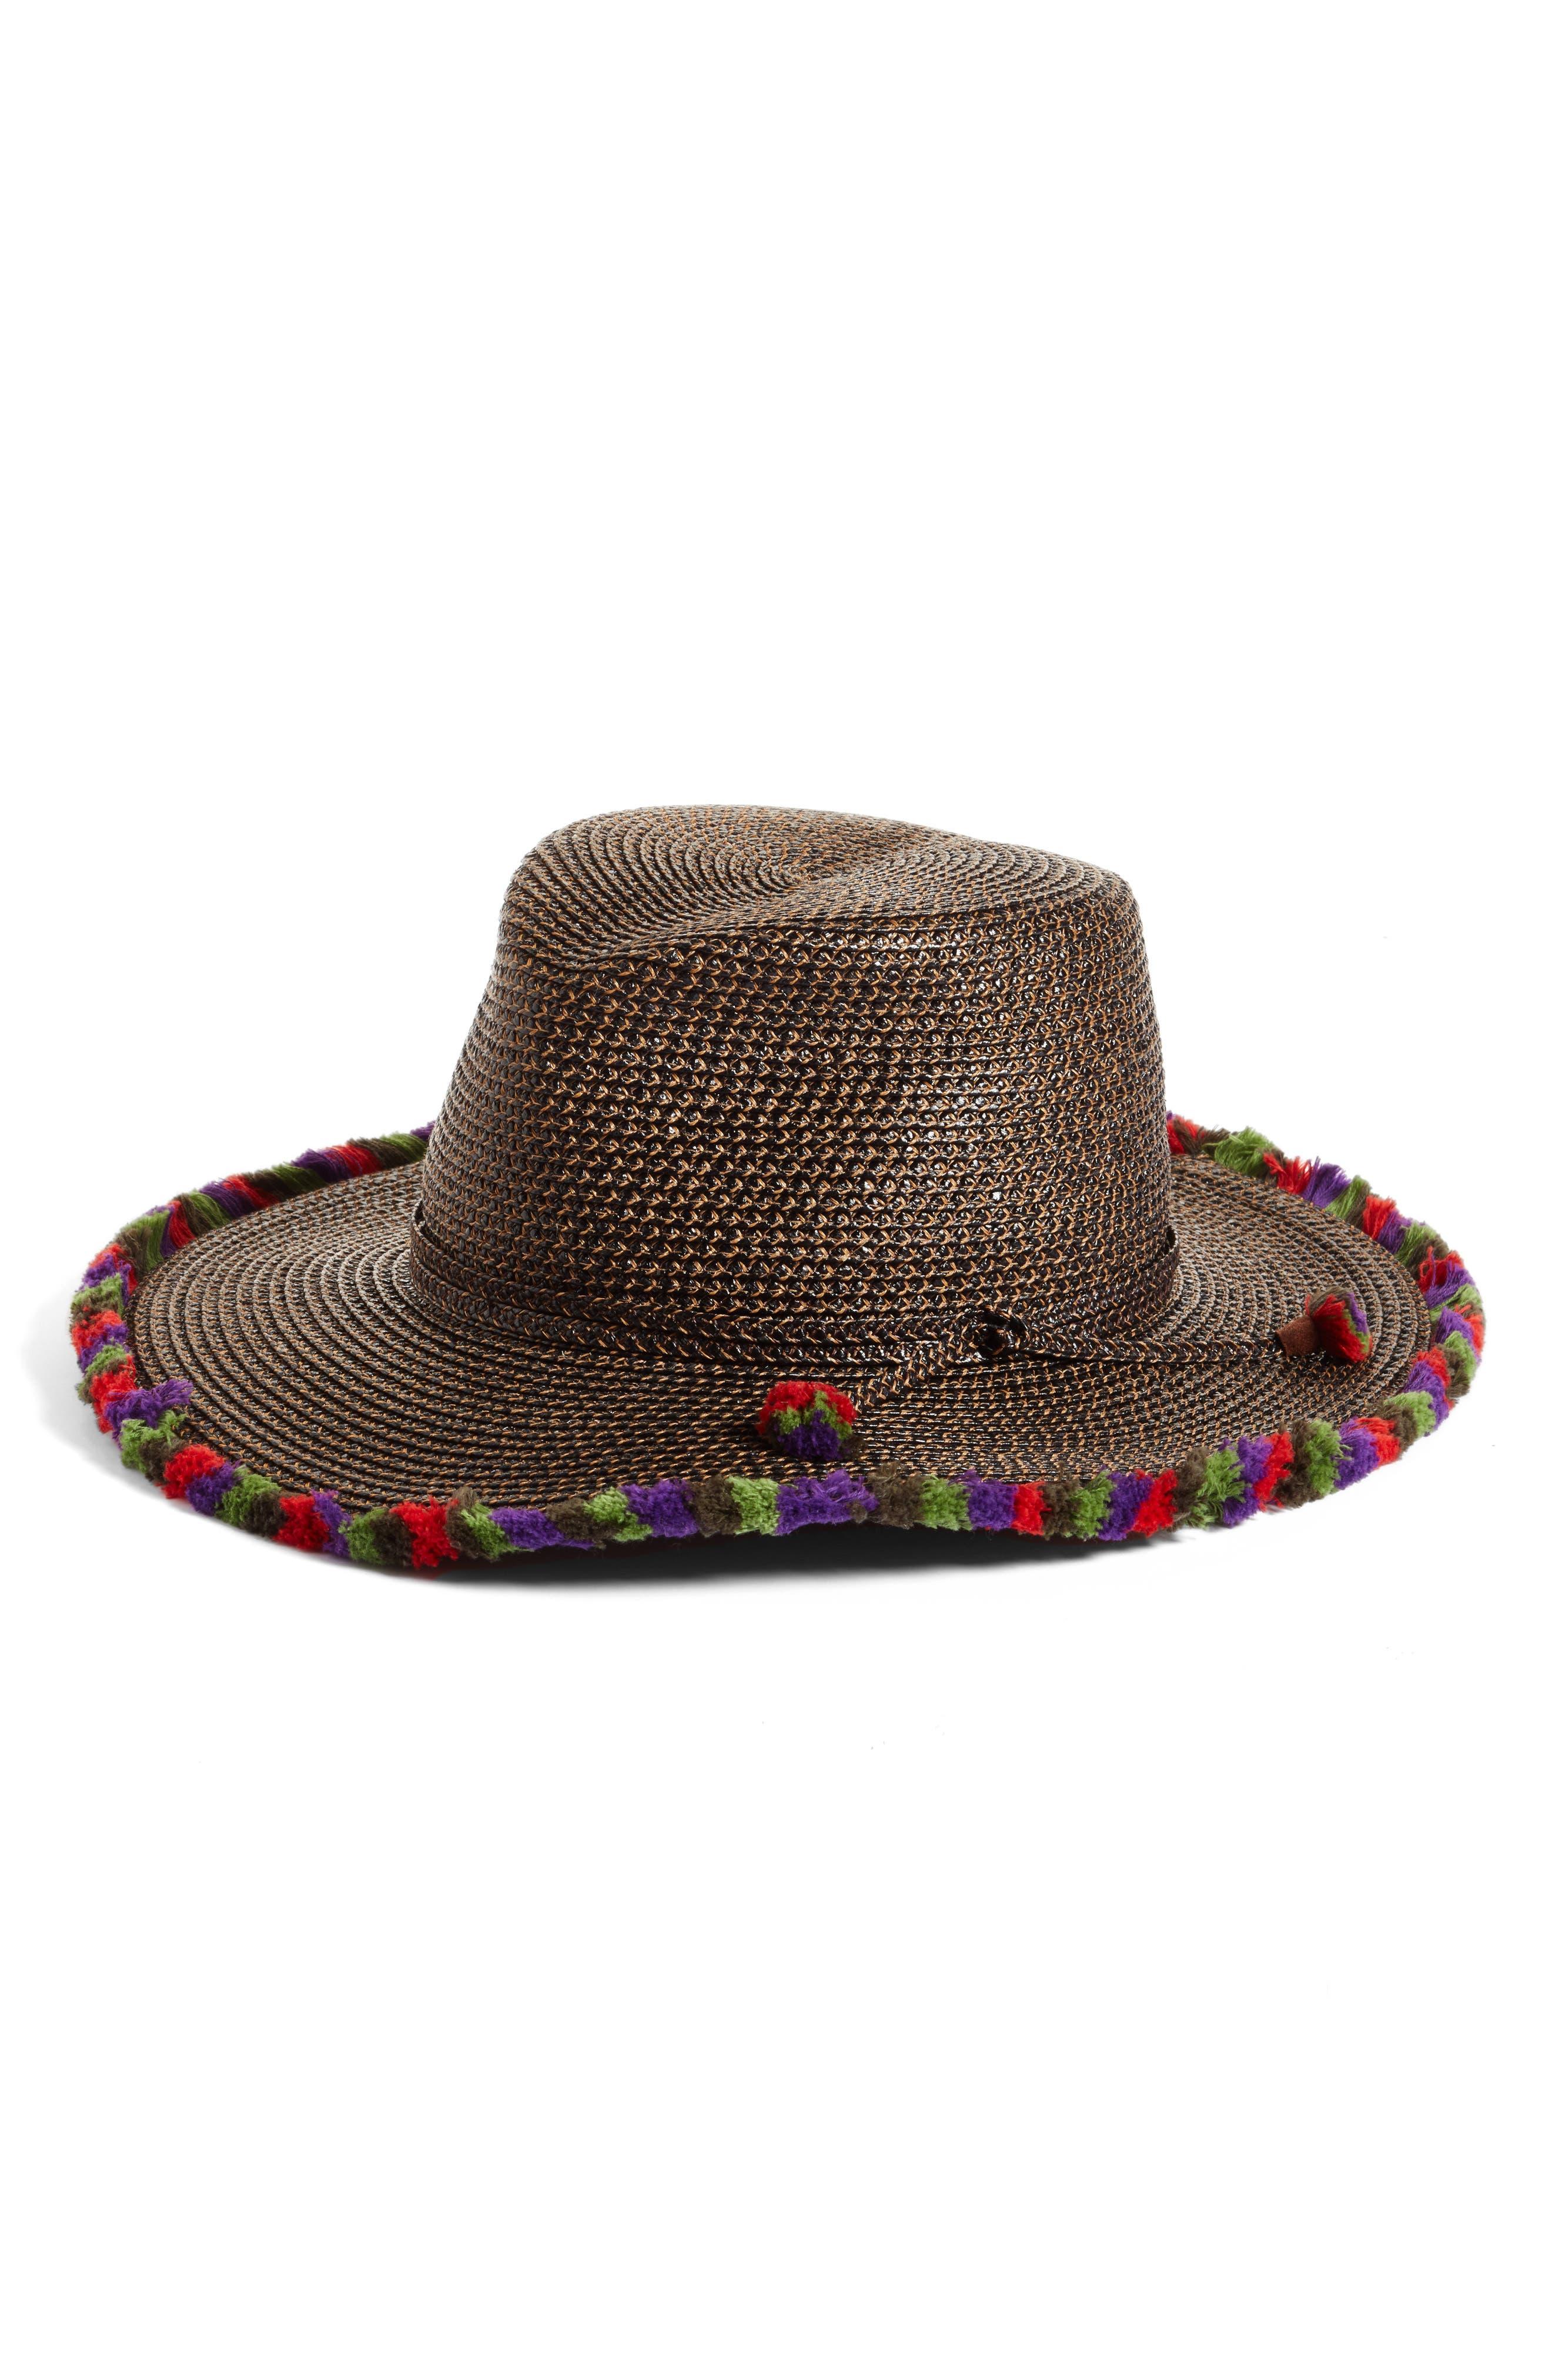 Alternate Image 1 Selected - Eric Javits Frida Packable Squishee® Fedora